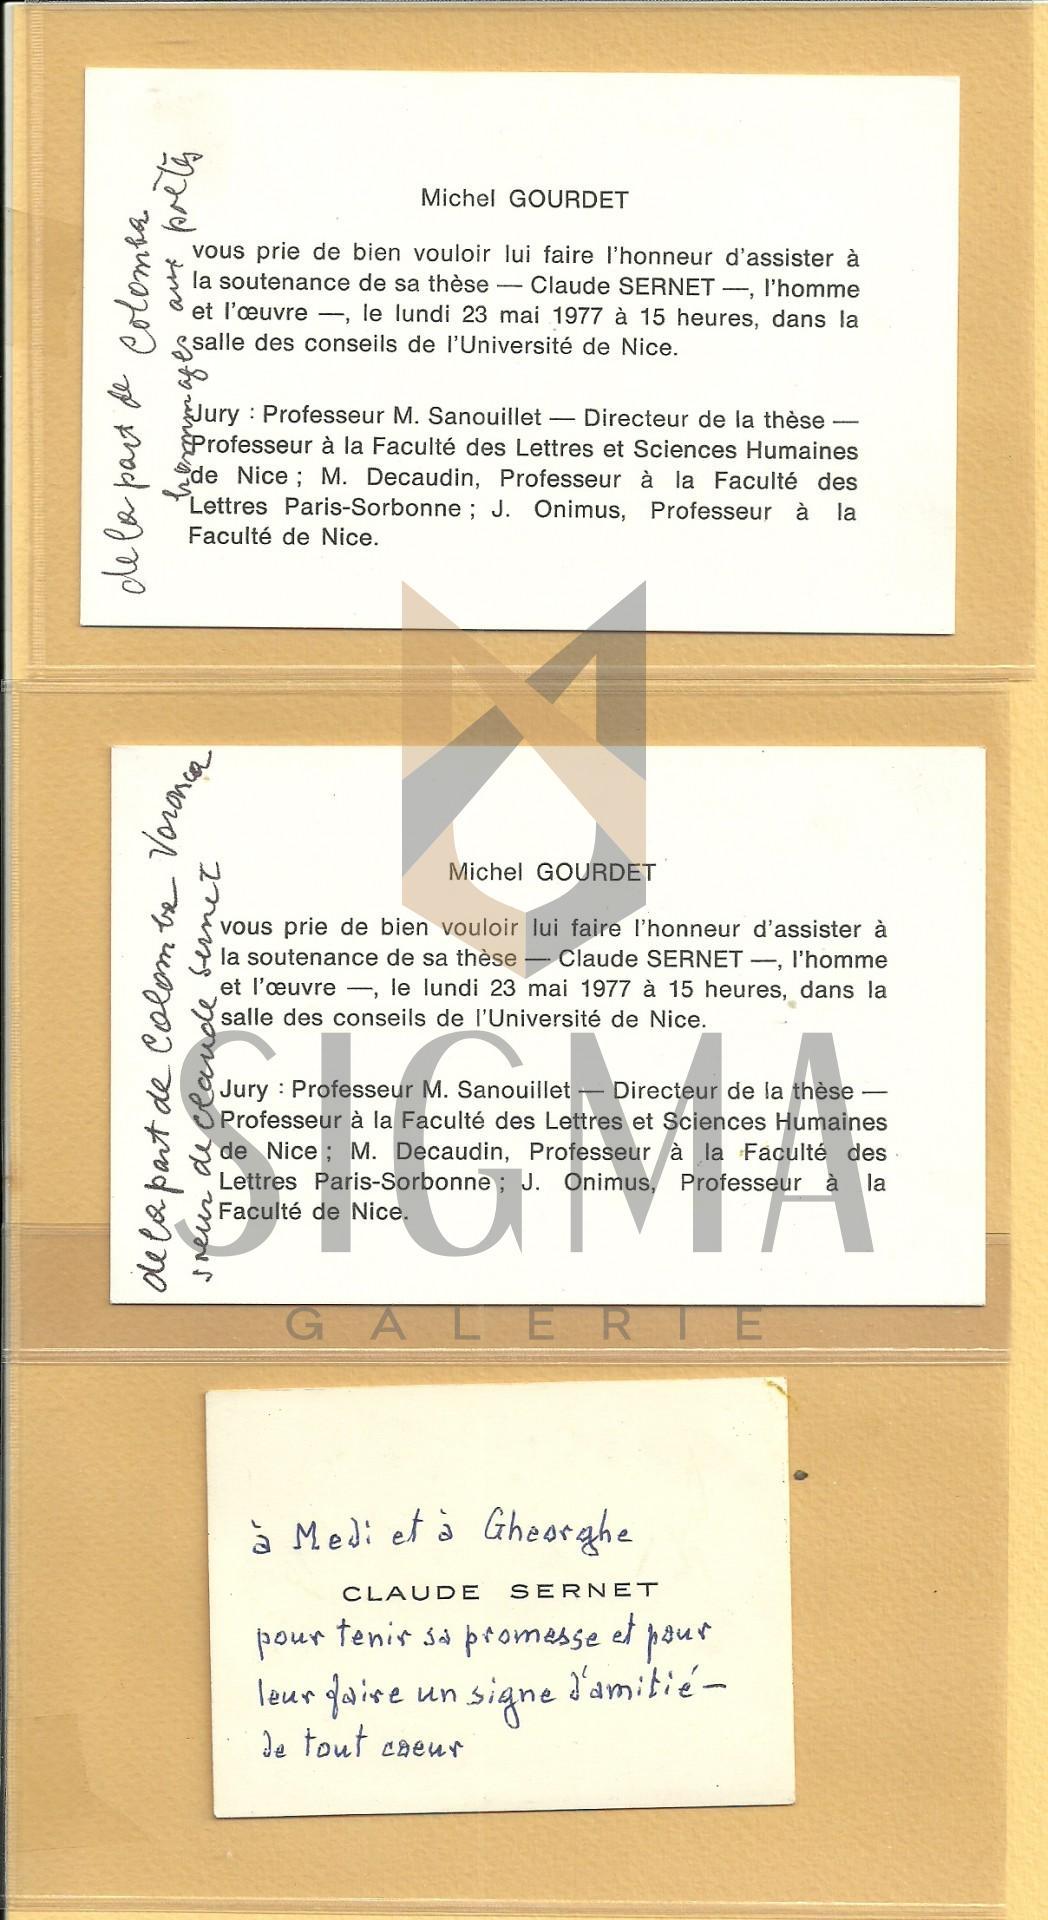 CLAUDE SERNET, MICHEL GOURDET (TEZA OPEREI LUI SERNET), MADI DINU, COLOMBA, FOX BRUNE